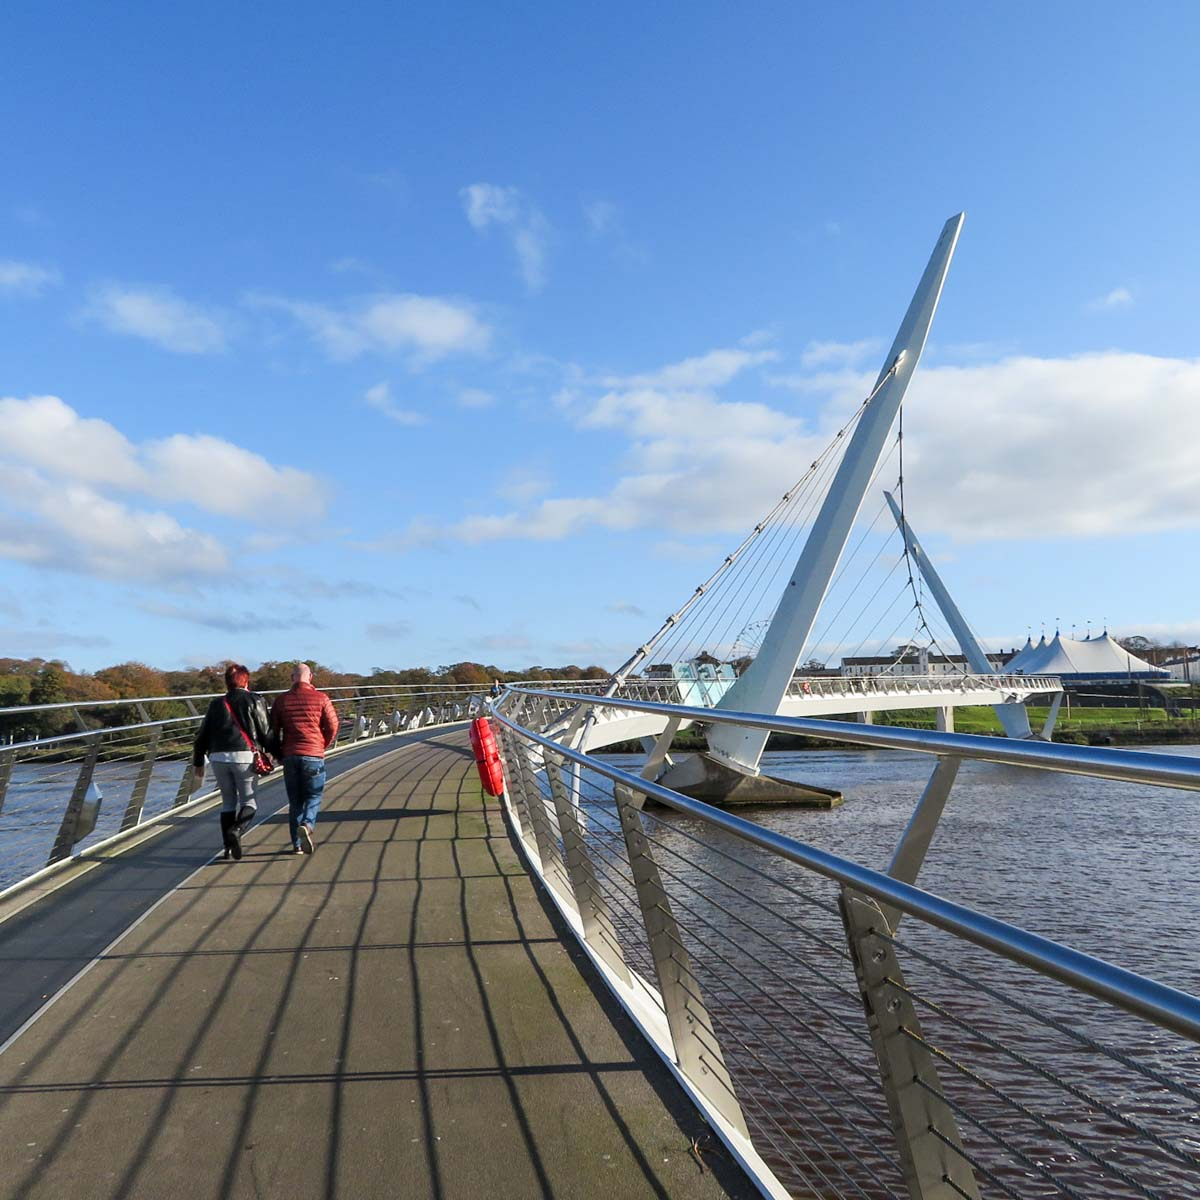 Stedentrip Derry-Londonderry: bezienswaardigheden en tips, Peace Bridge